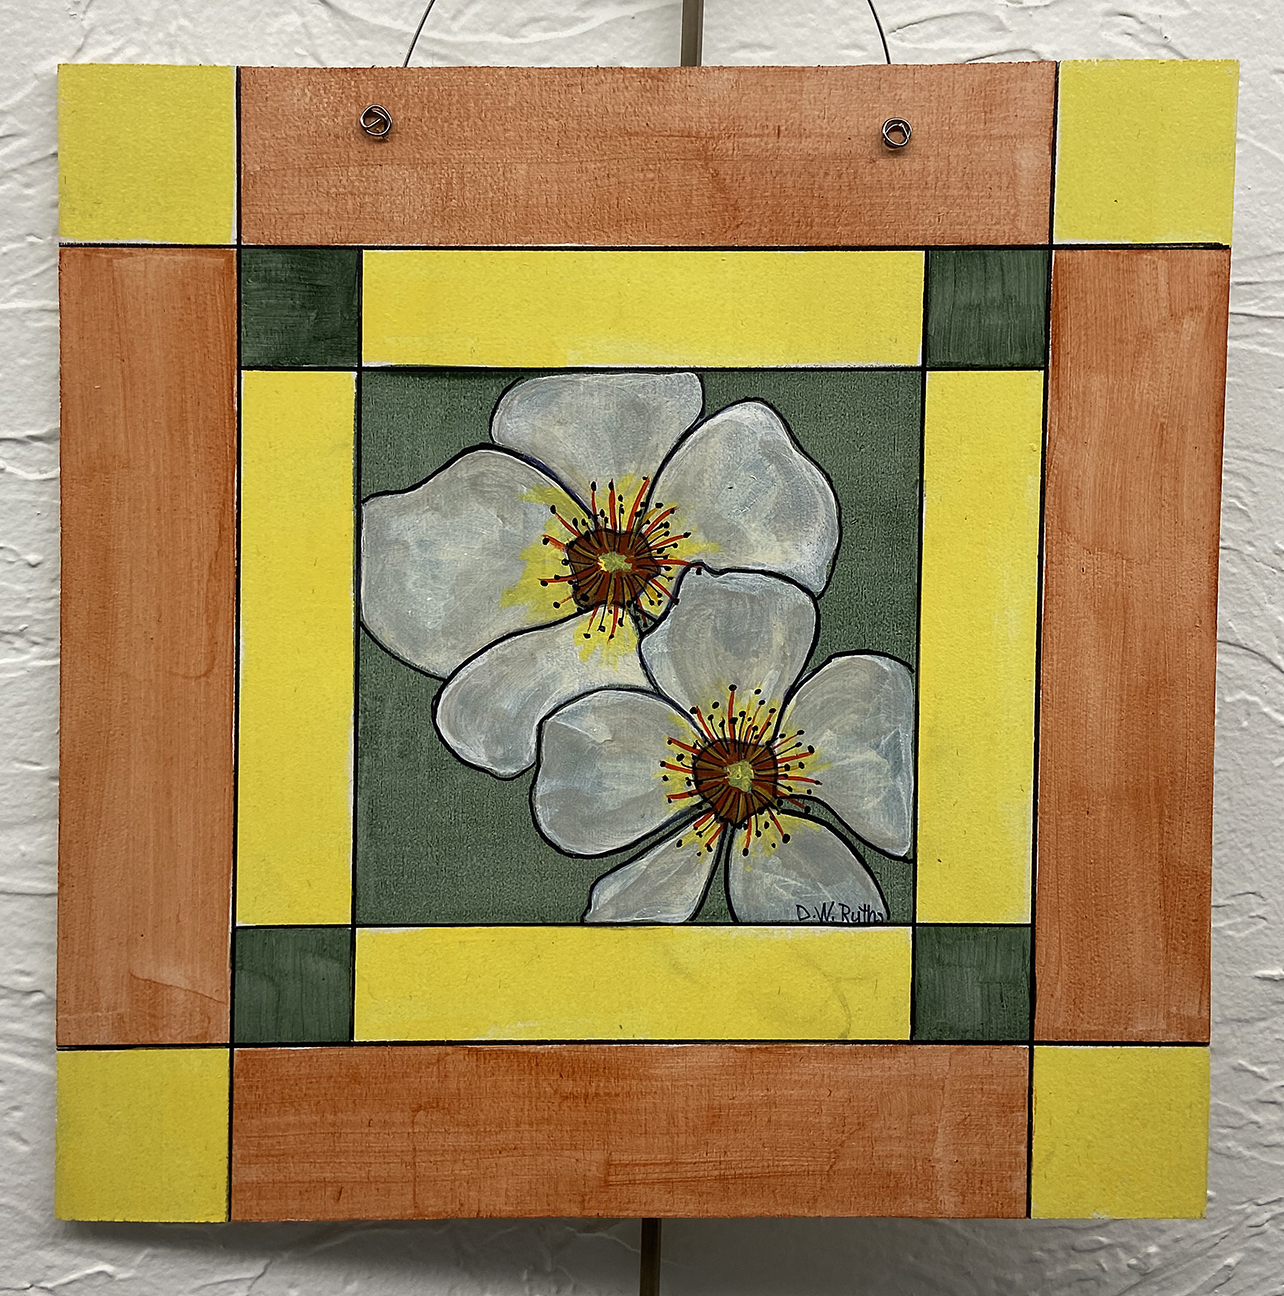 #3 Pansies, Deb Ruths, Acrylic on Wood (10 x 10), $15.00 suggested minimum bid  (47 meals)